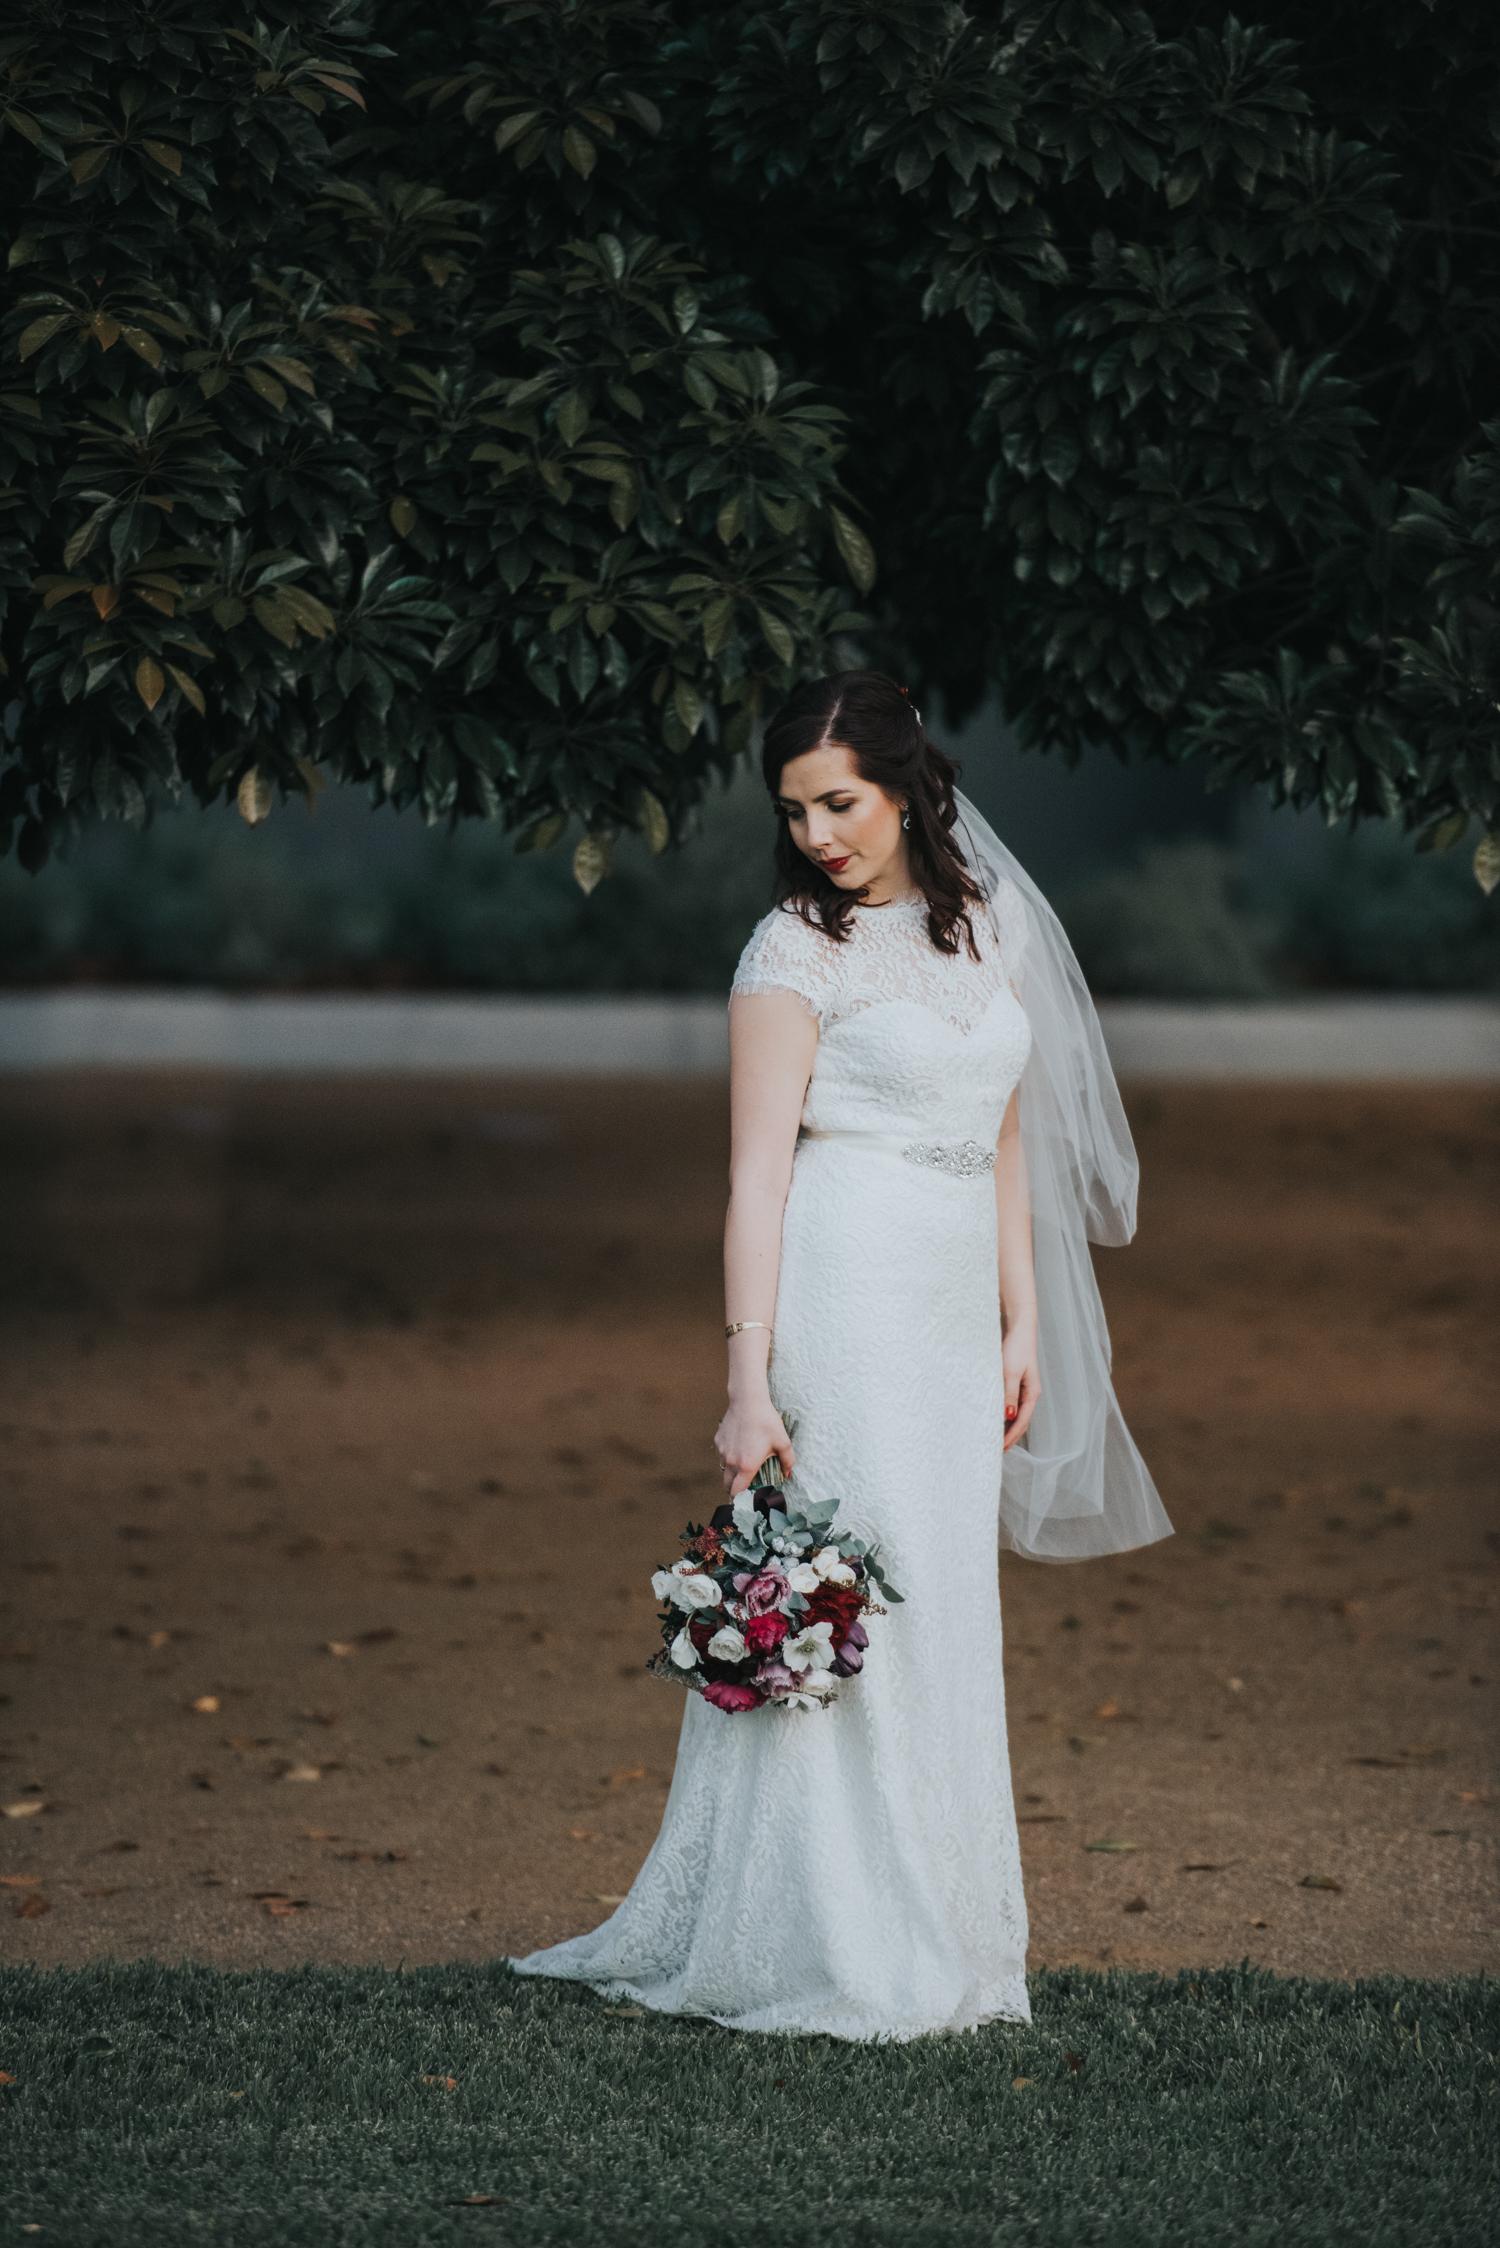 Brisbane Wedding Photographer | Elopement-Engagement Photographer-36.jpg